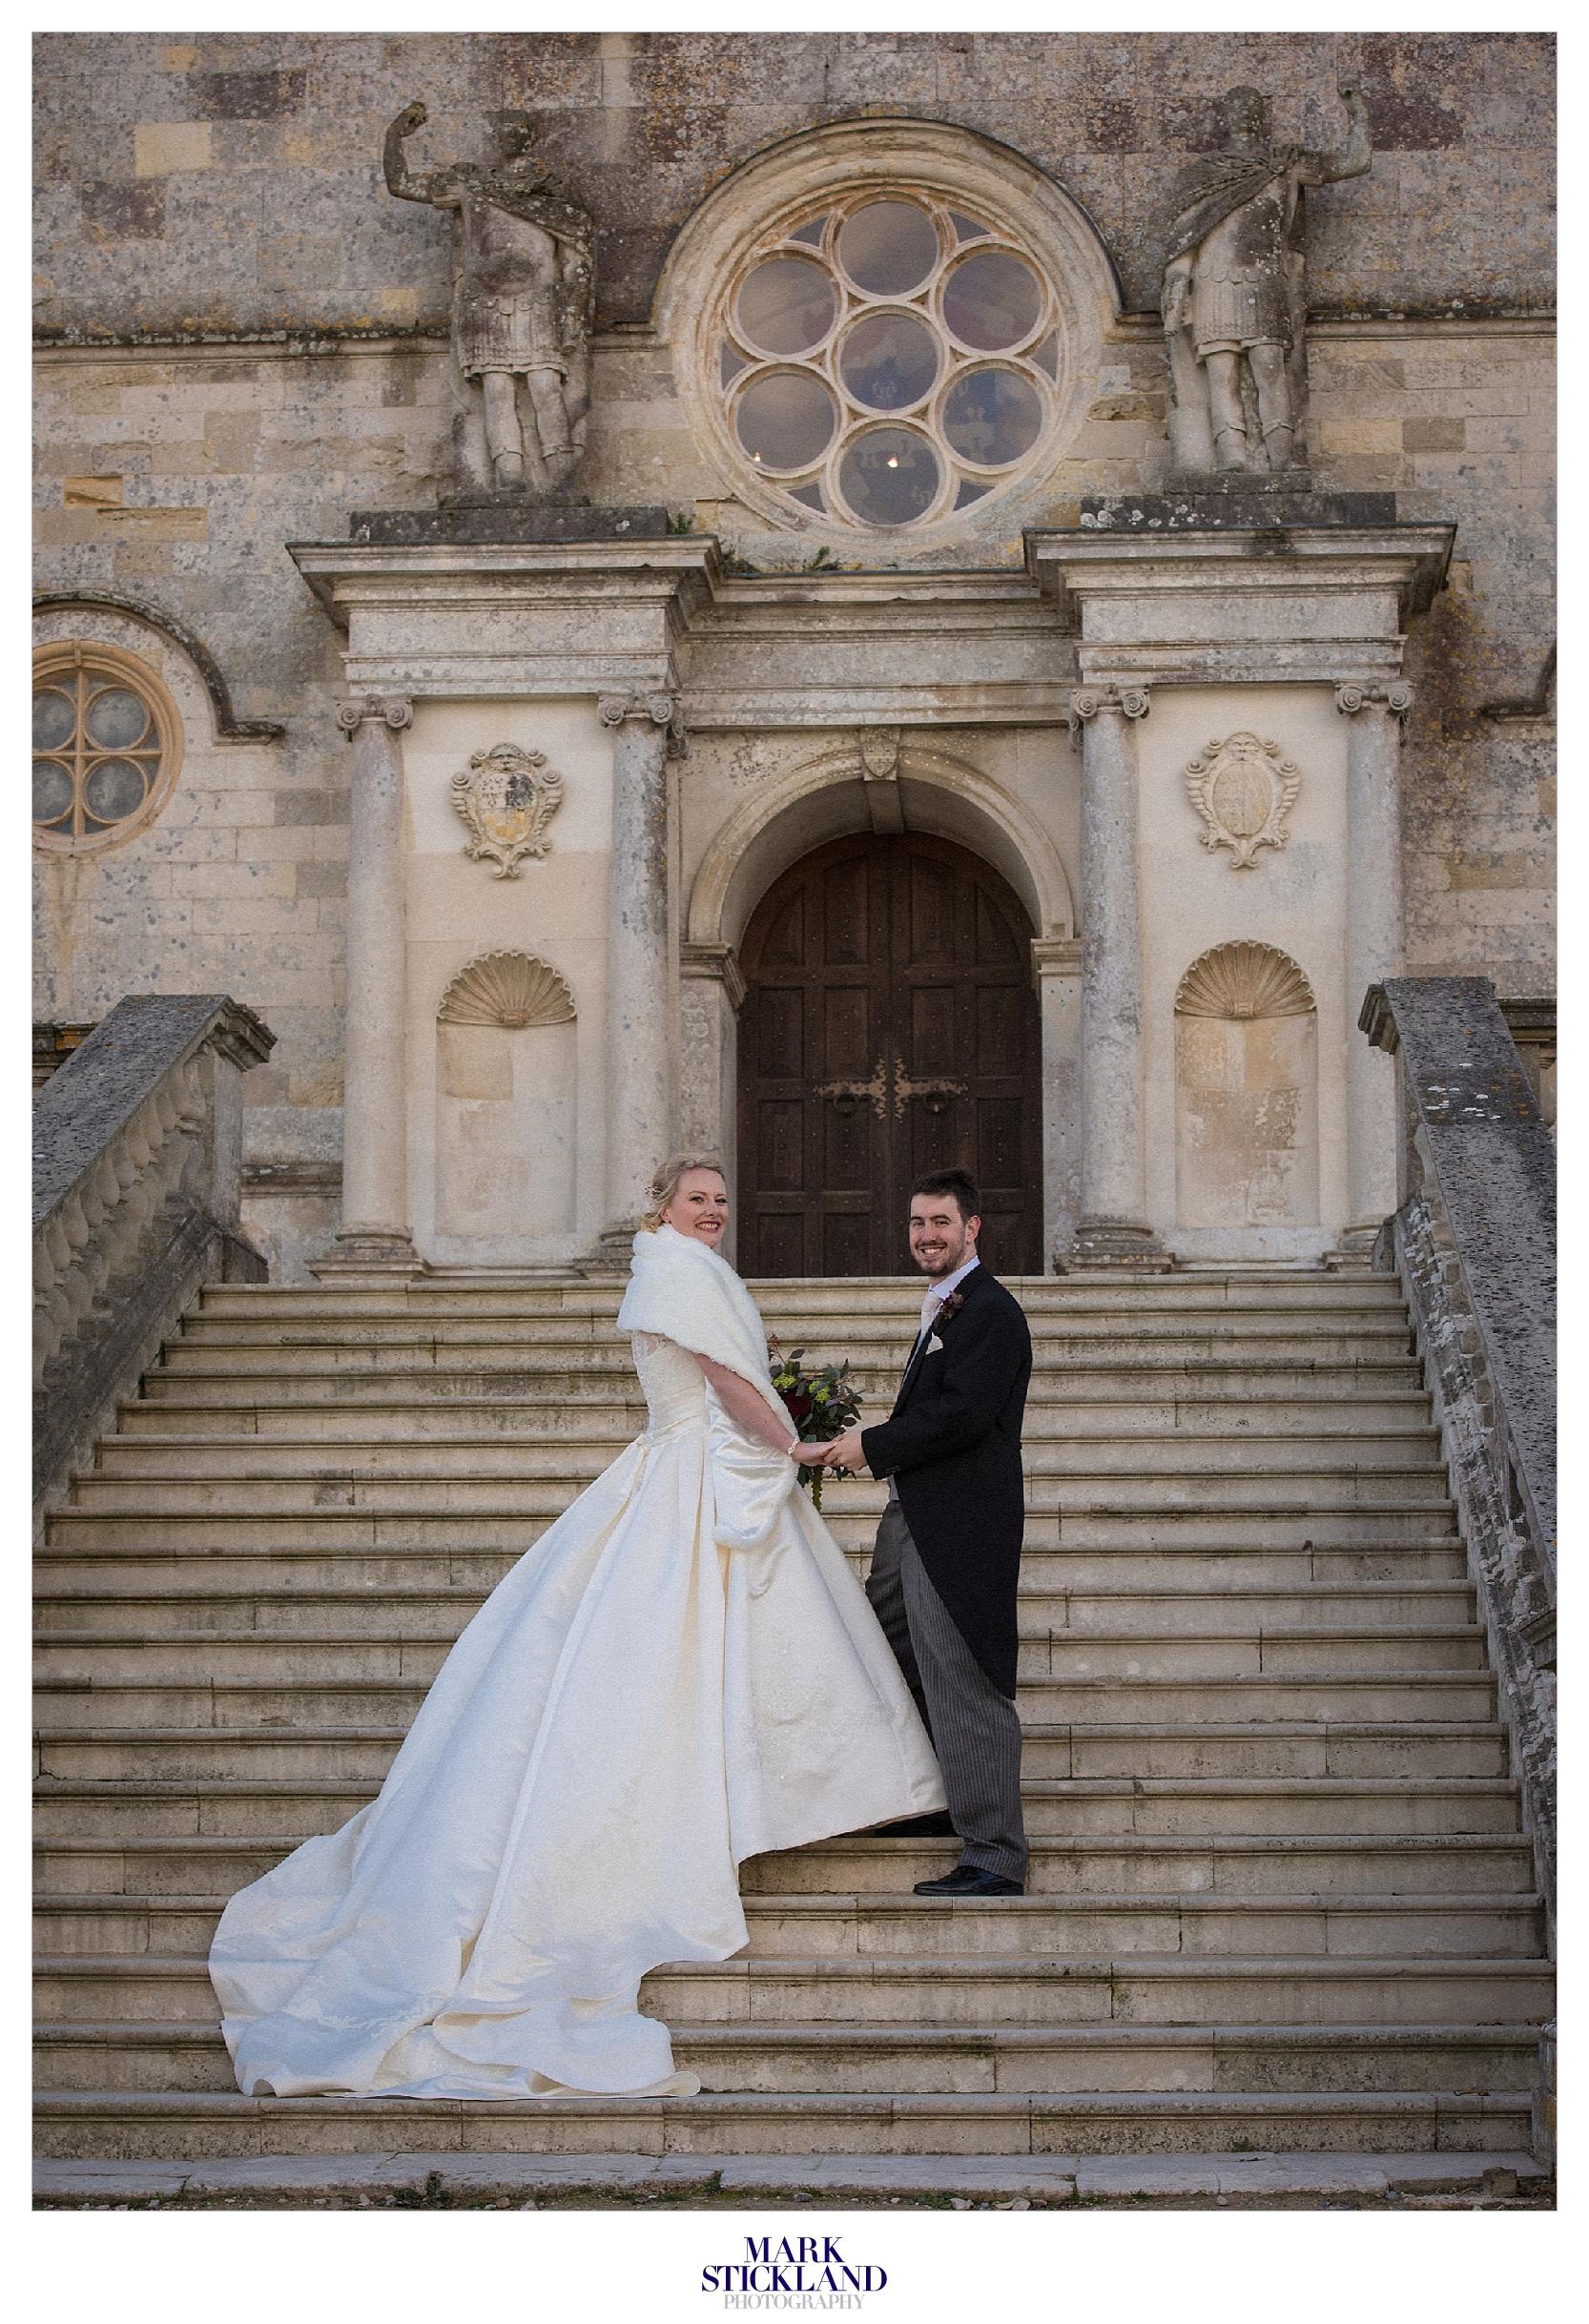 lulworth_castle_wedding_dorset_mark stickland photography.21